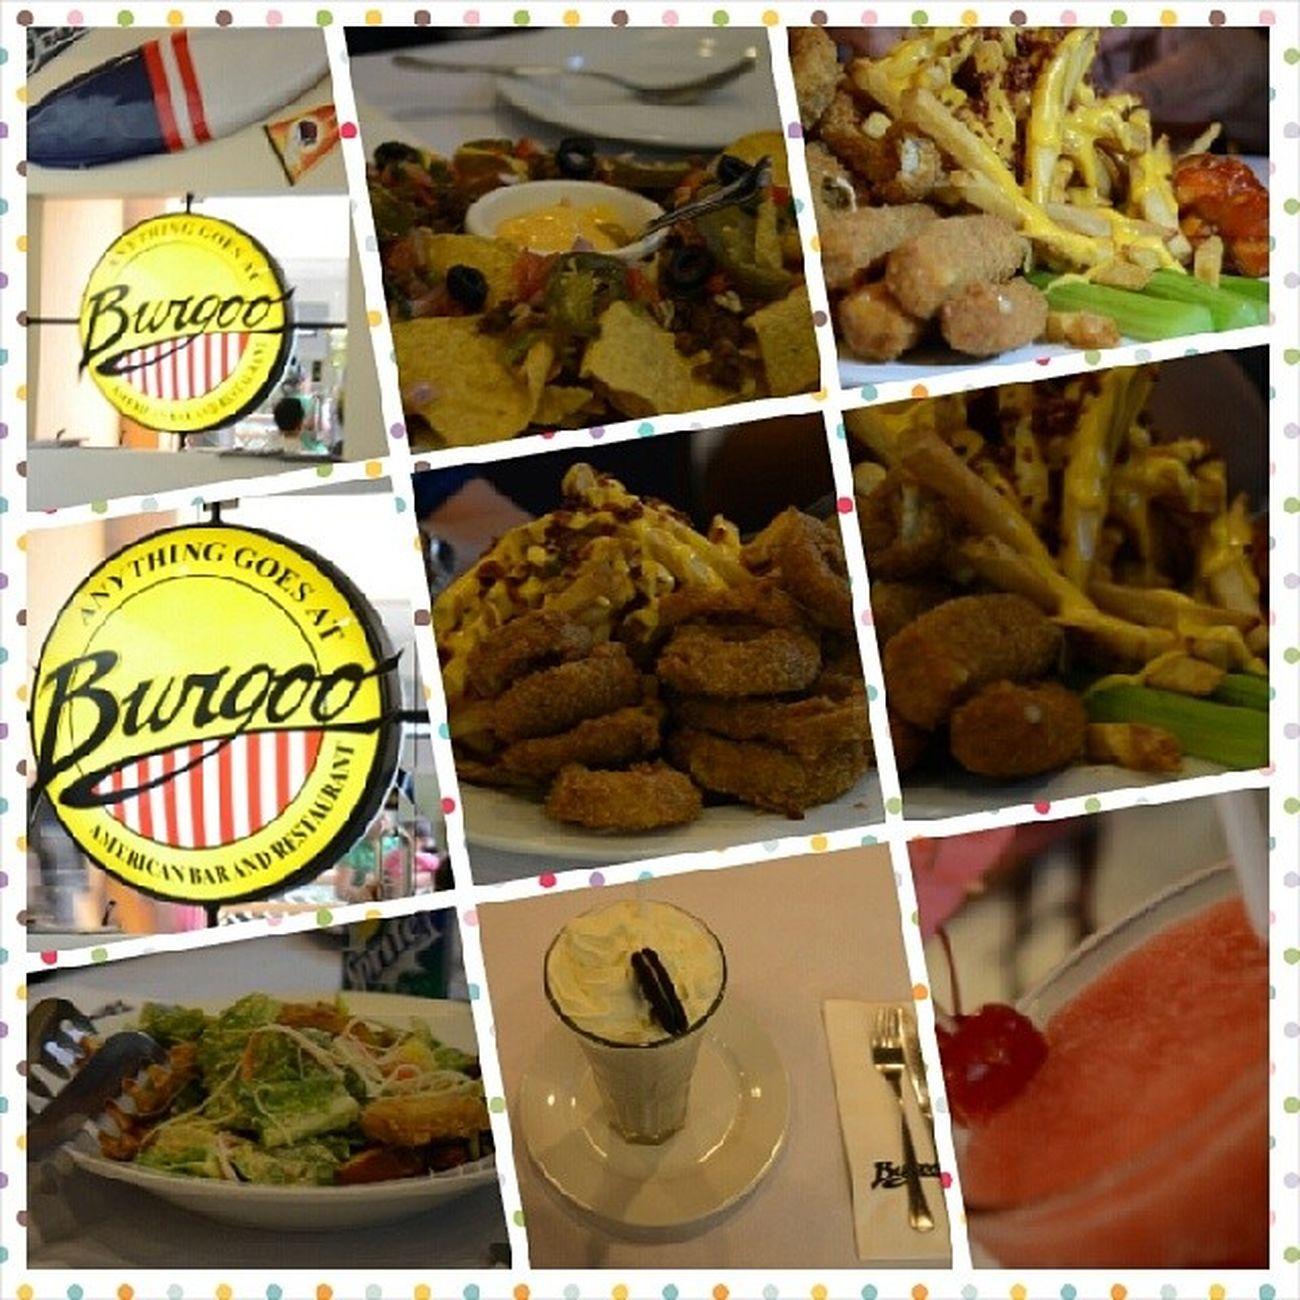 American foods. Shakes Shrimps Fries Burgers Pizza Salad Babybackribs Burrp !Delicious Burgoo MOA